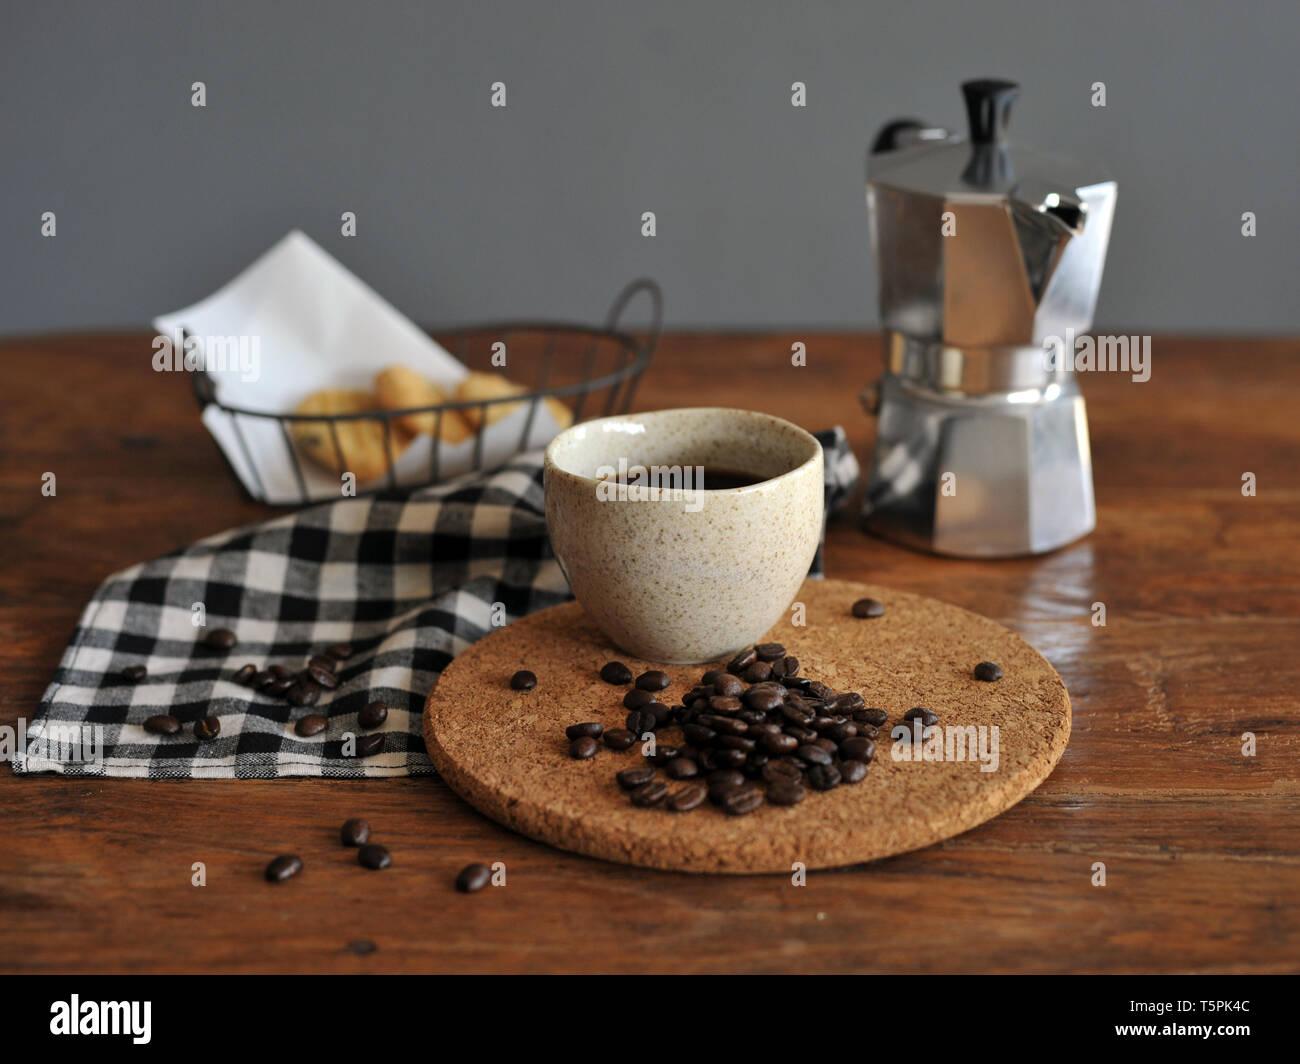 Moka pot coffee maker and coffee cup, steel italian espresso coffee pot - Stock Image